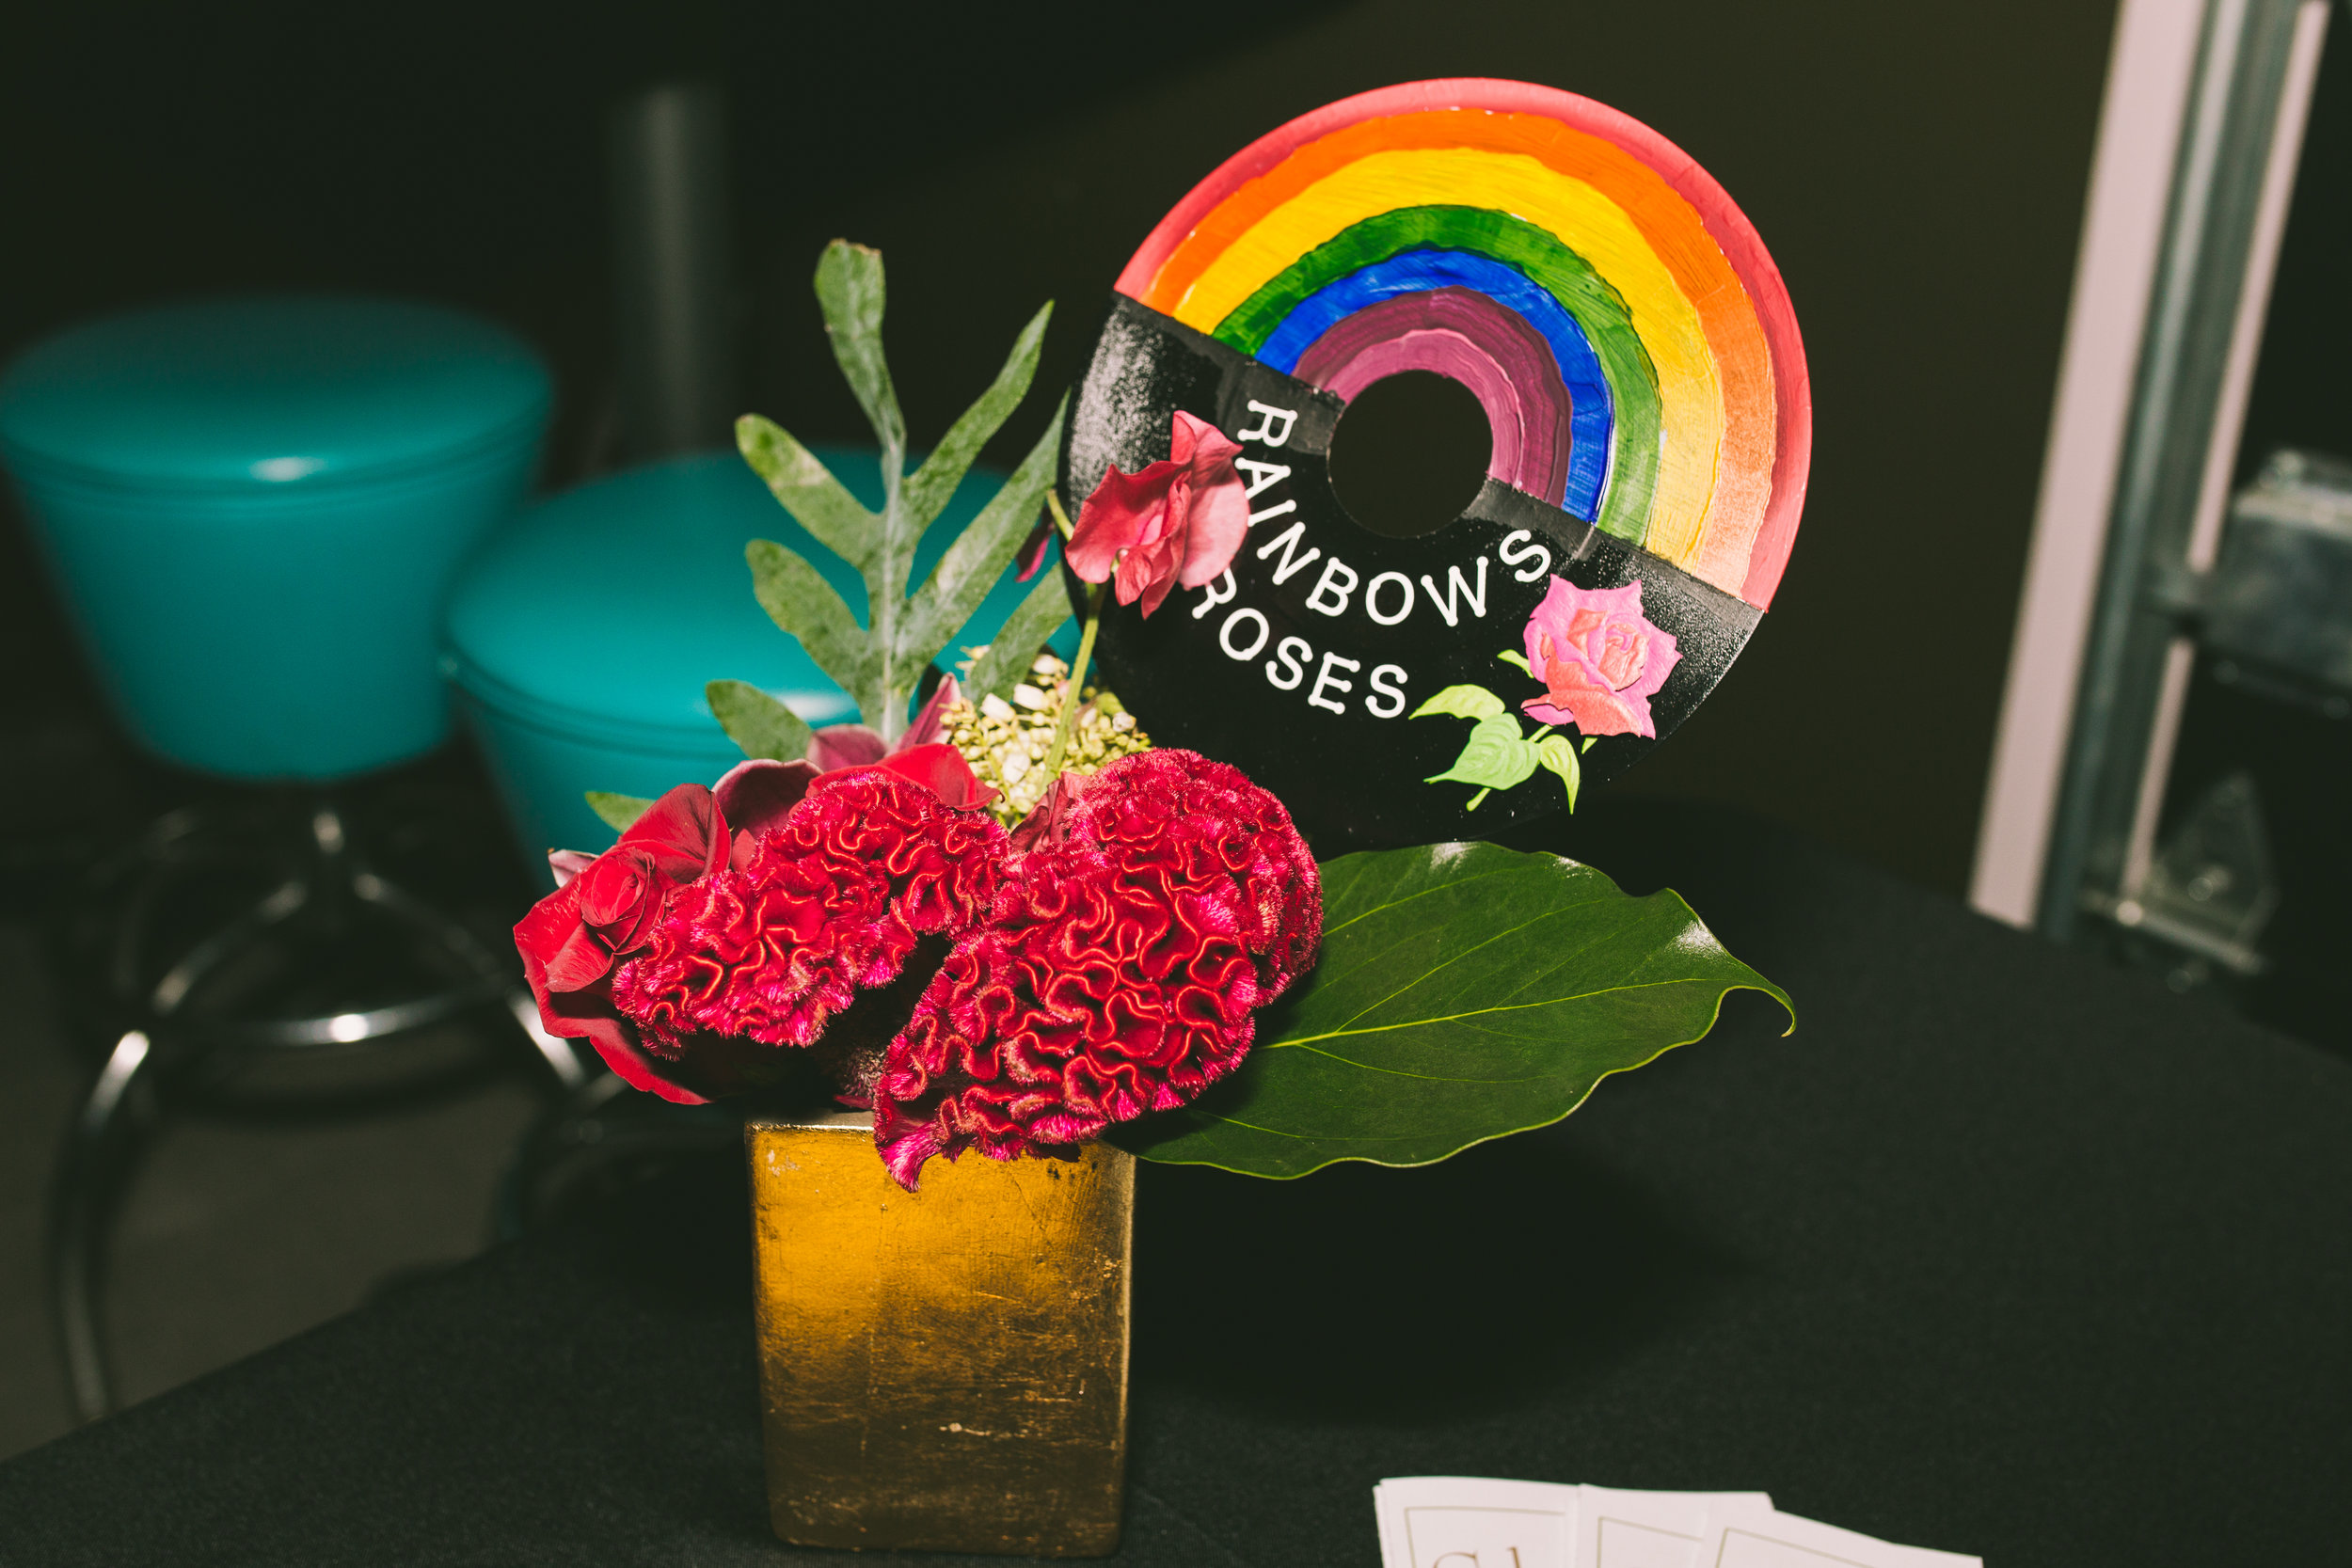 Rainbows & Roses Thurby 2017 WEBSITE FEVA PLAY Crystal Ludwick Photo 4.jpg